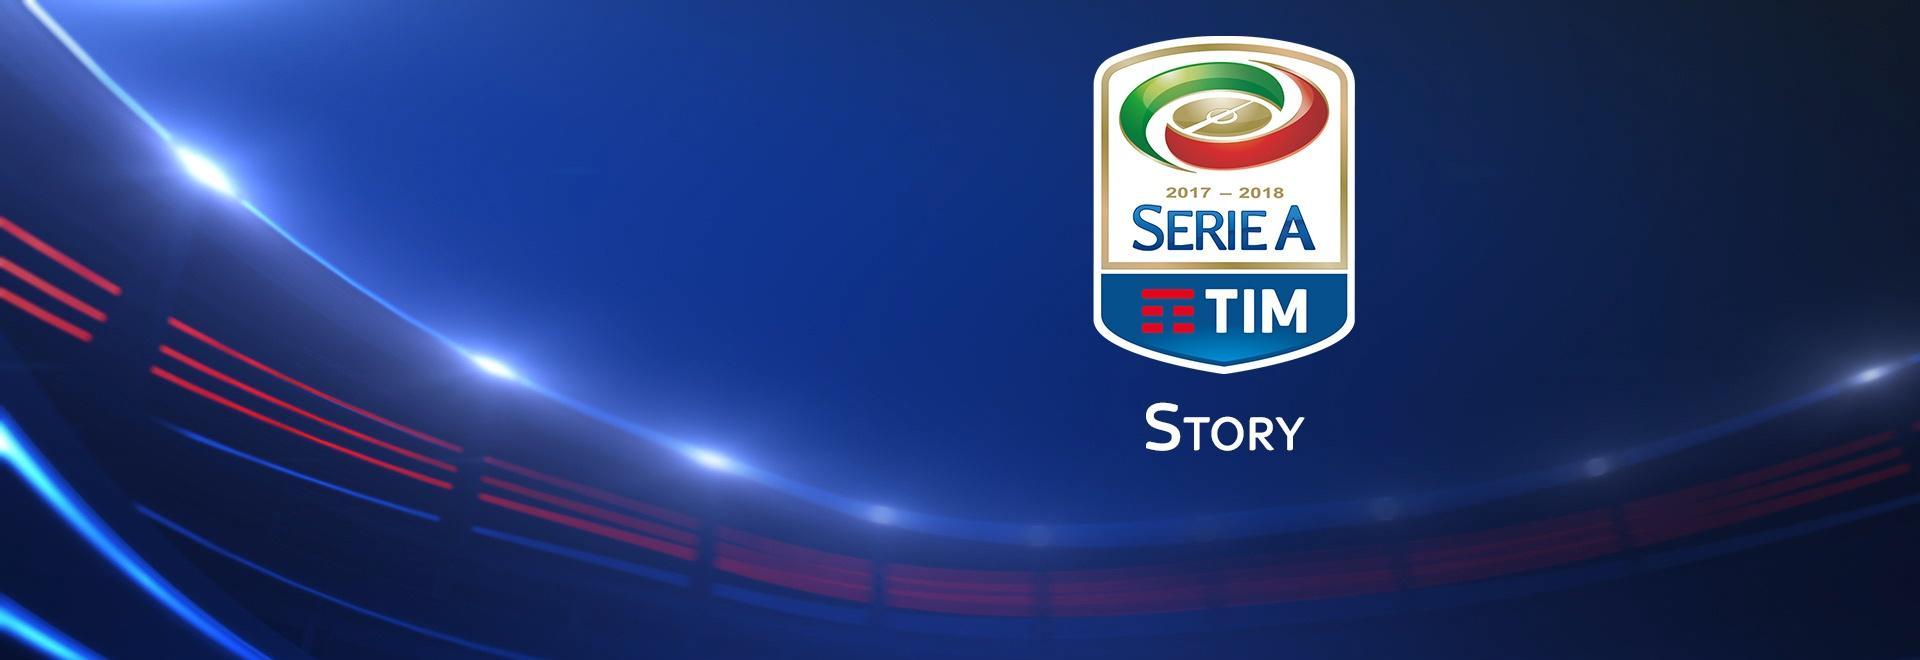 Milan - Lazio 09/09/11